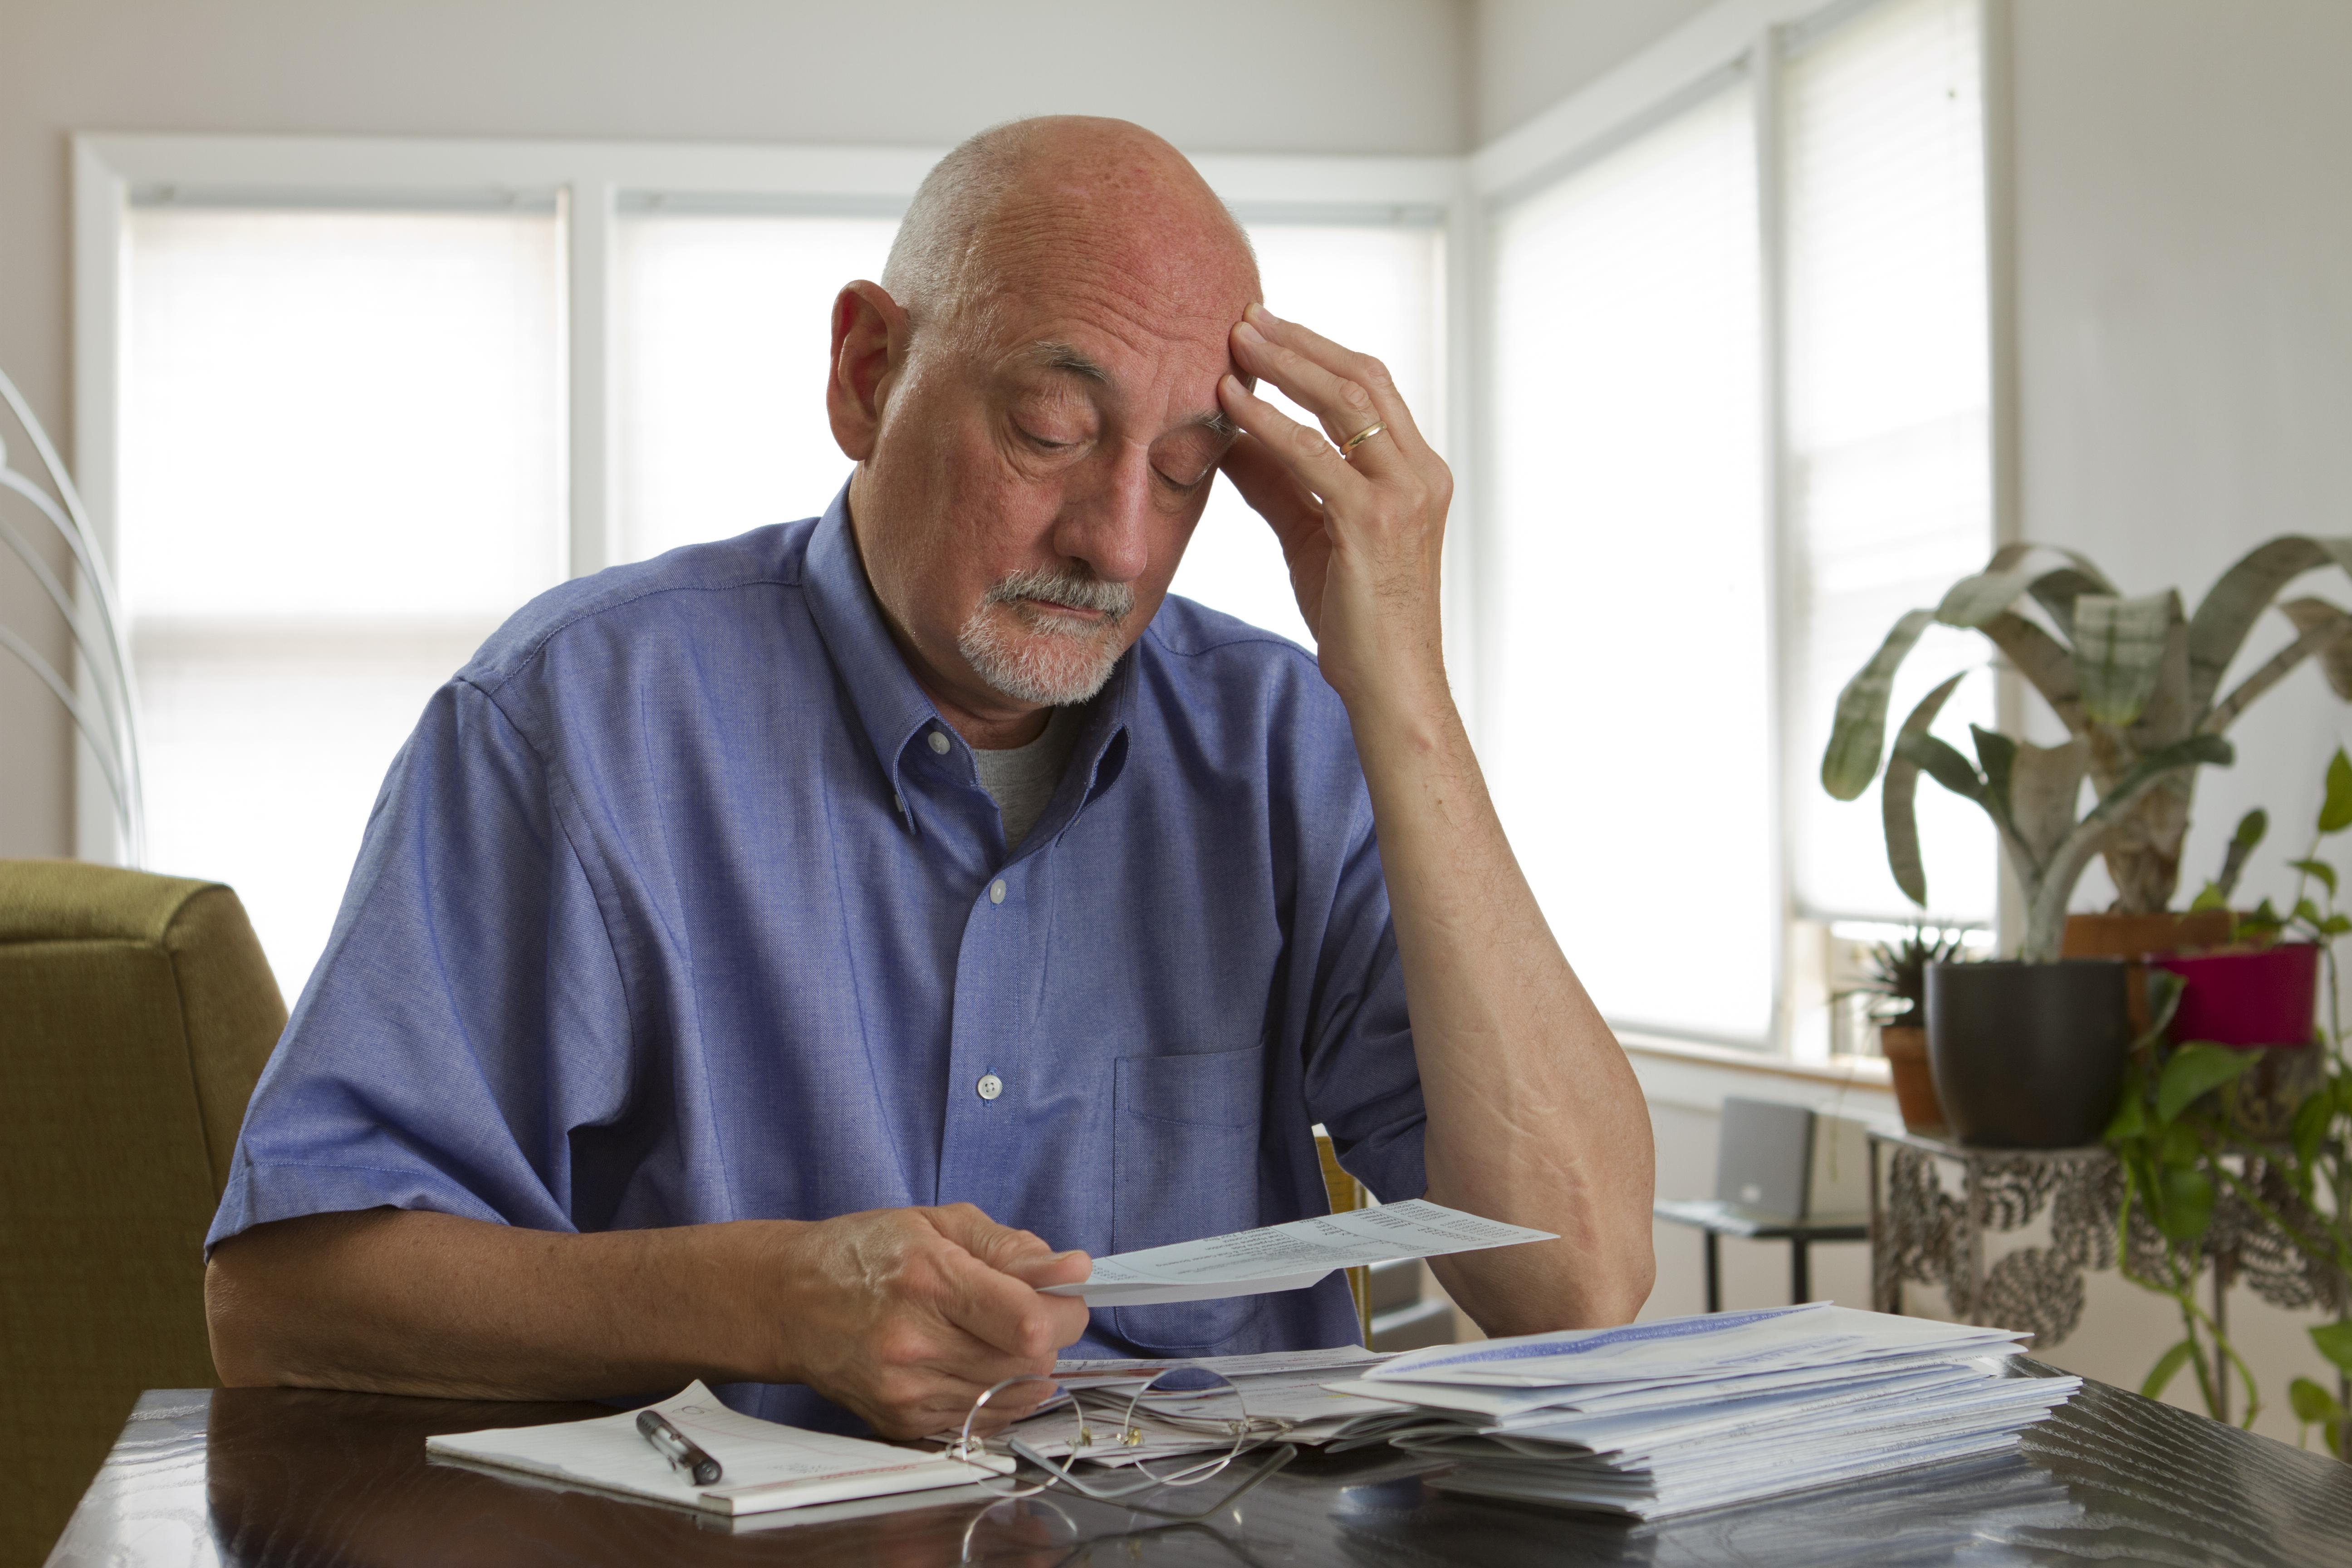 Senior man looking at bills, worried